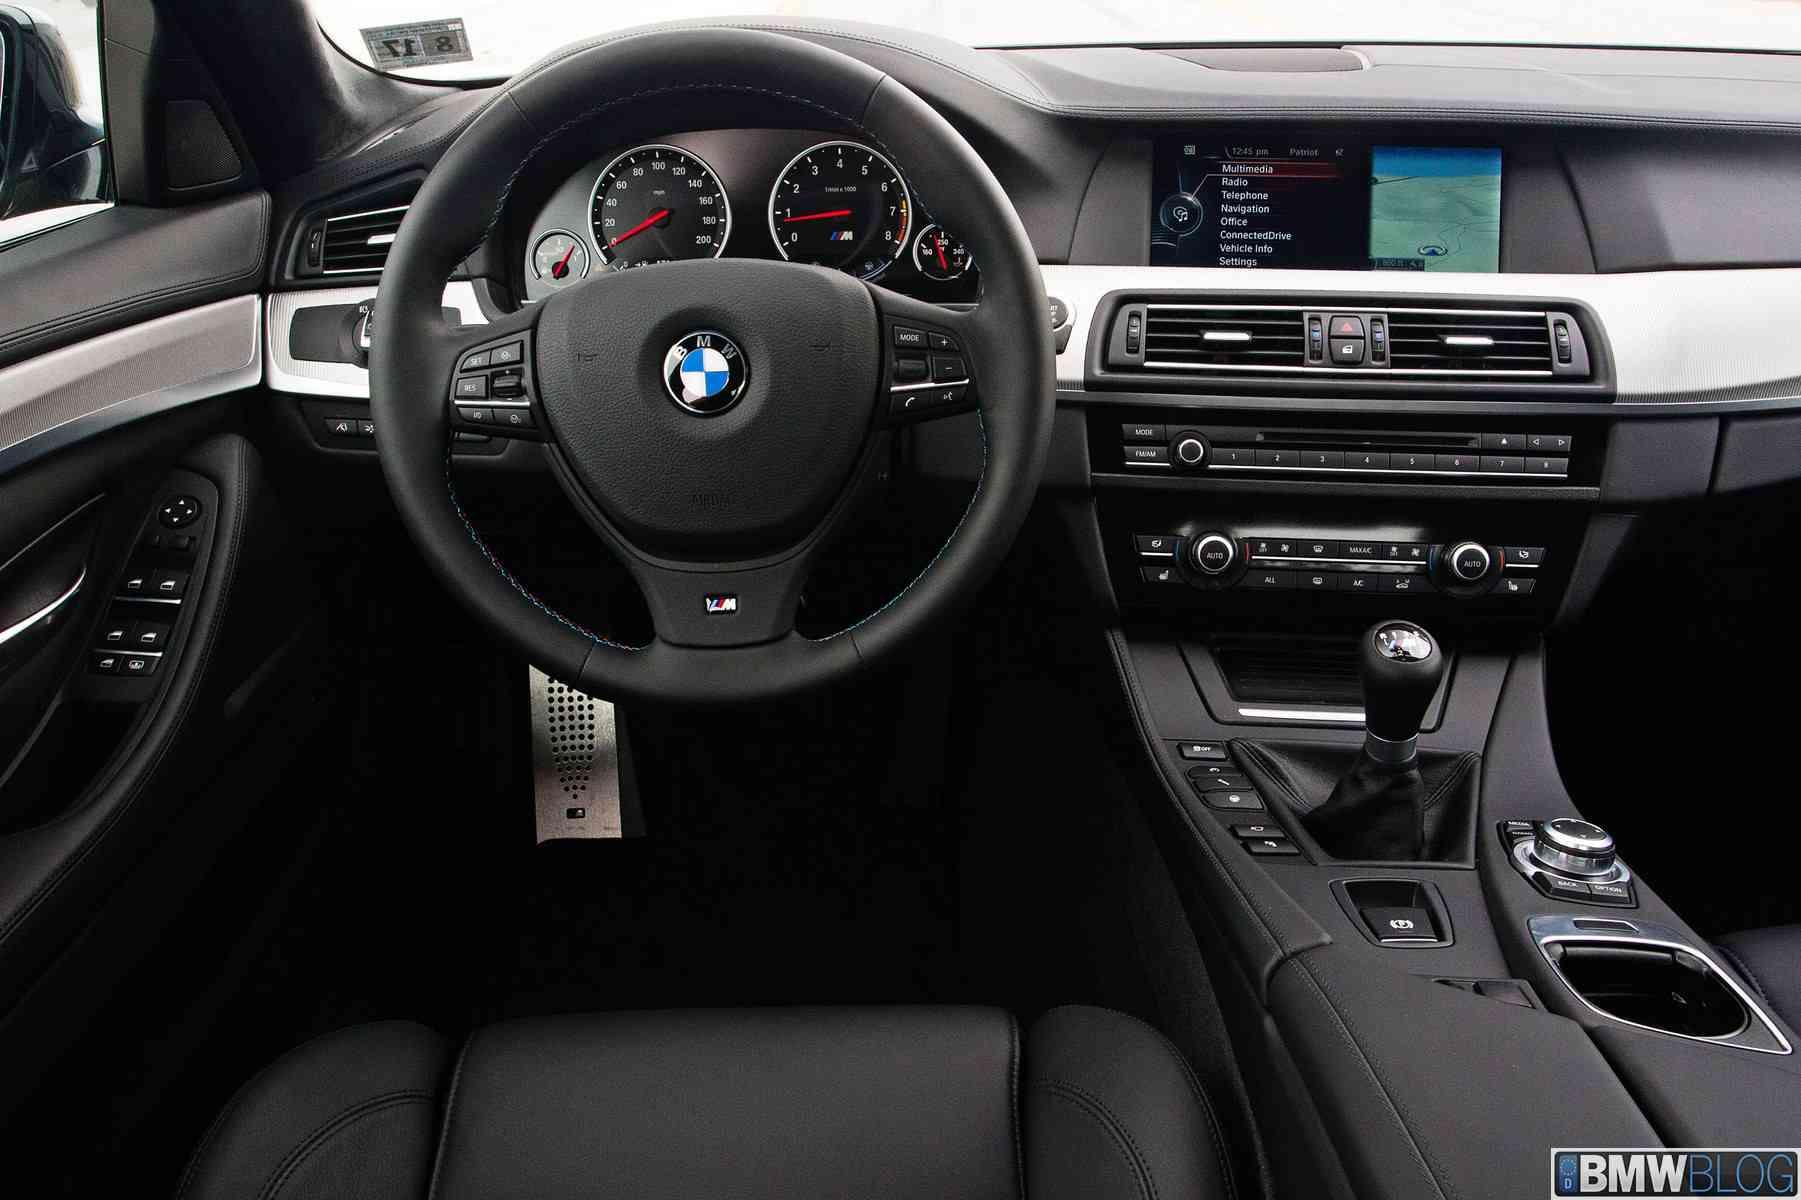 bmw x1 manual transmission